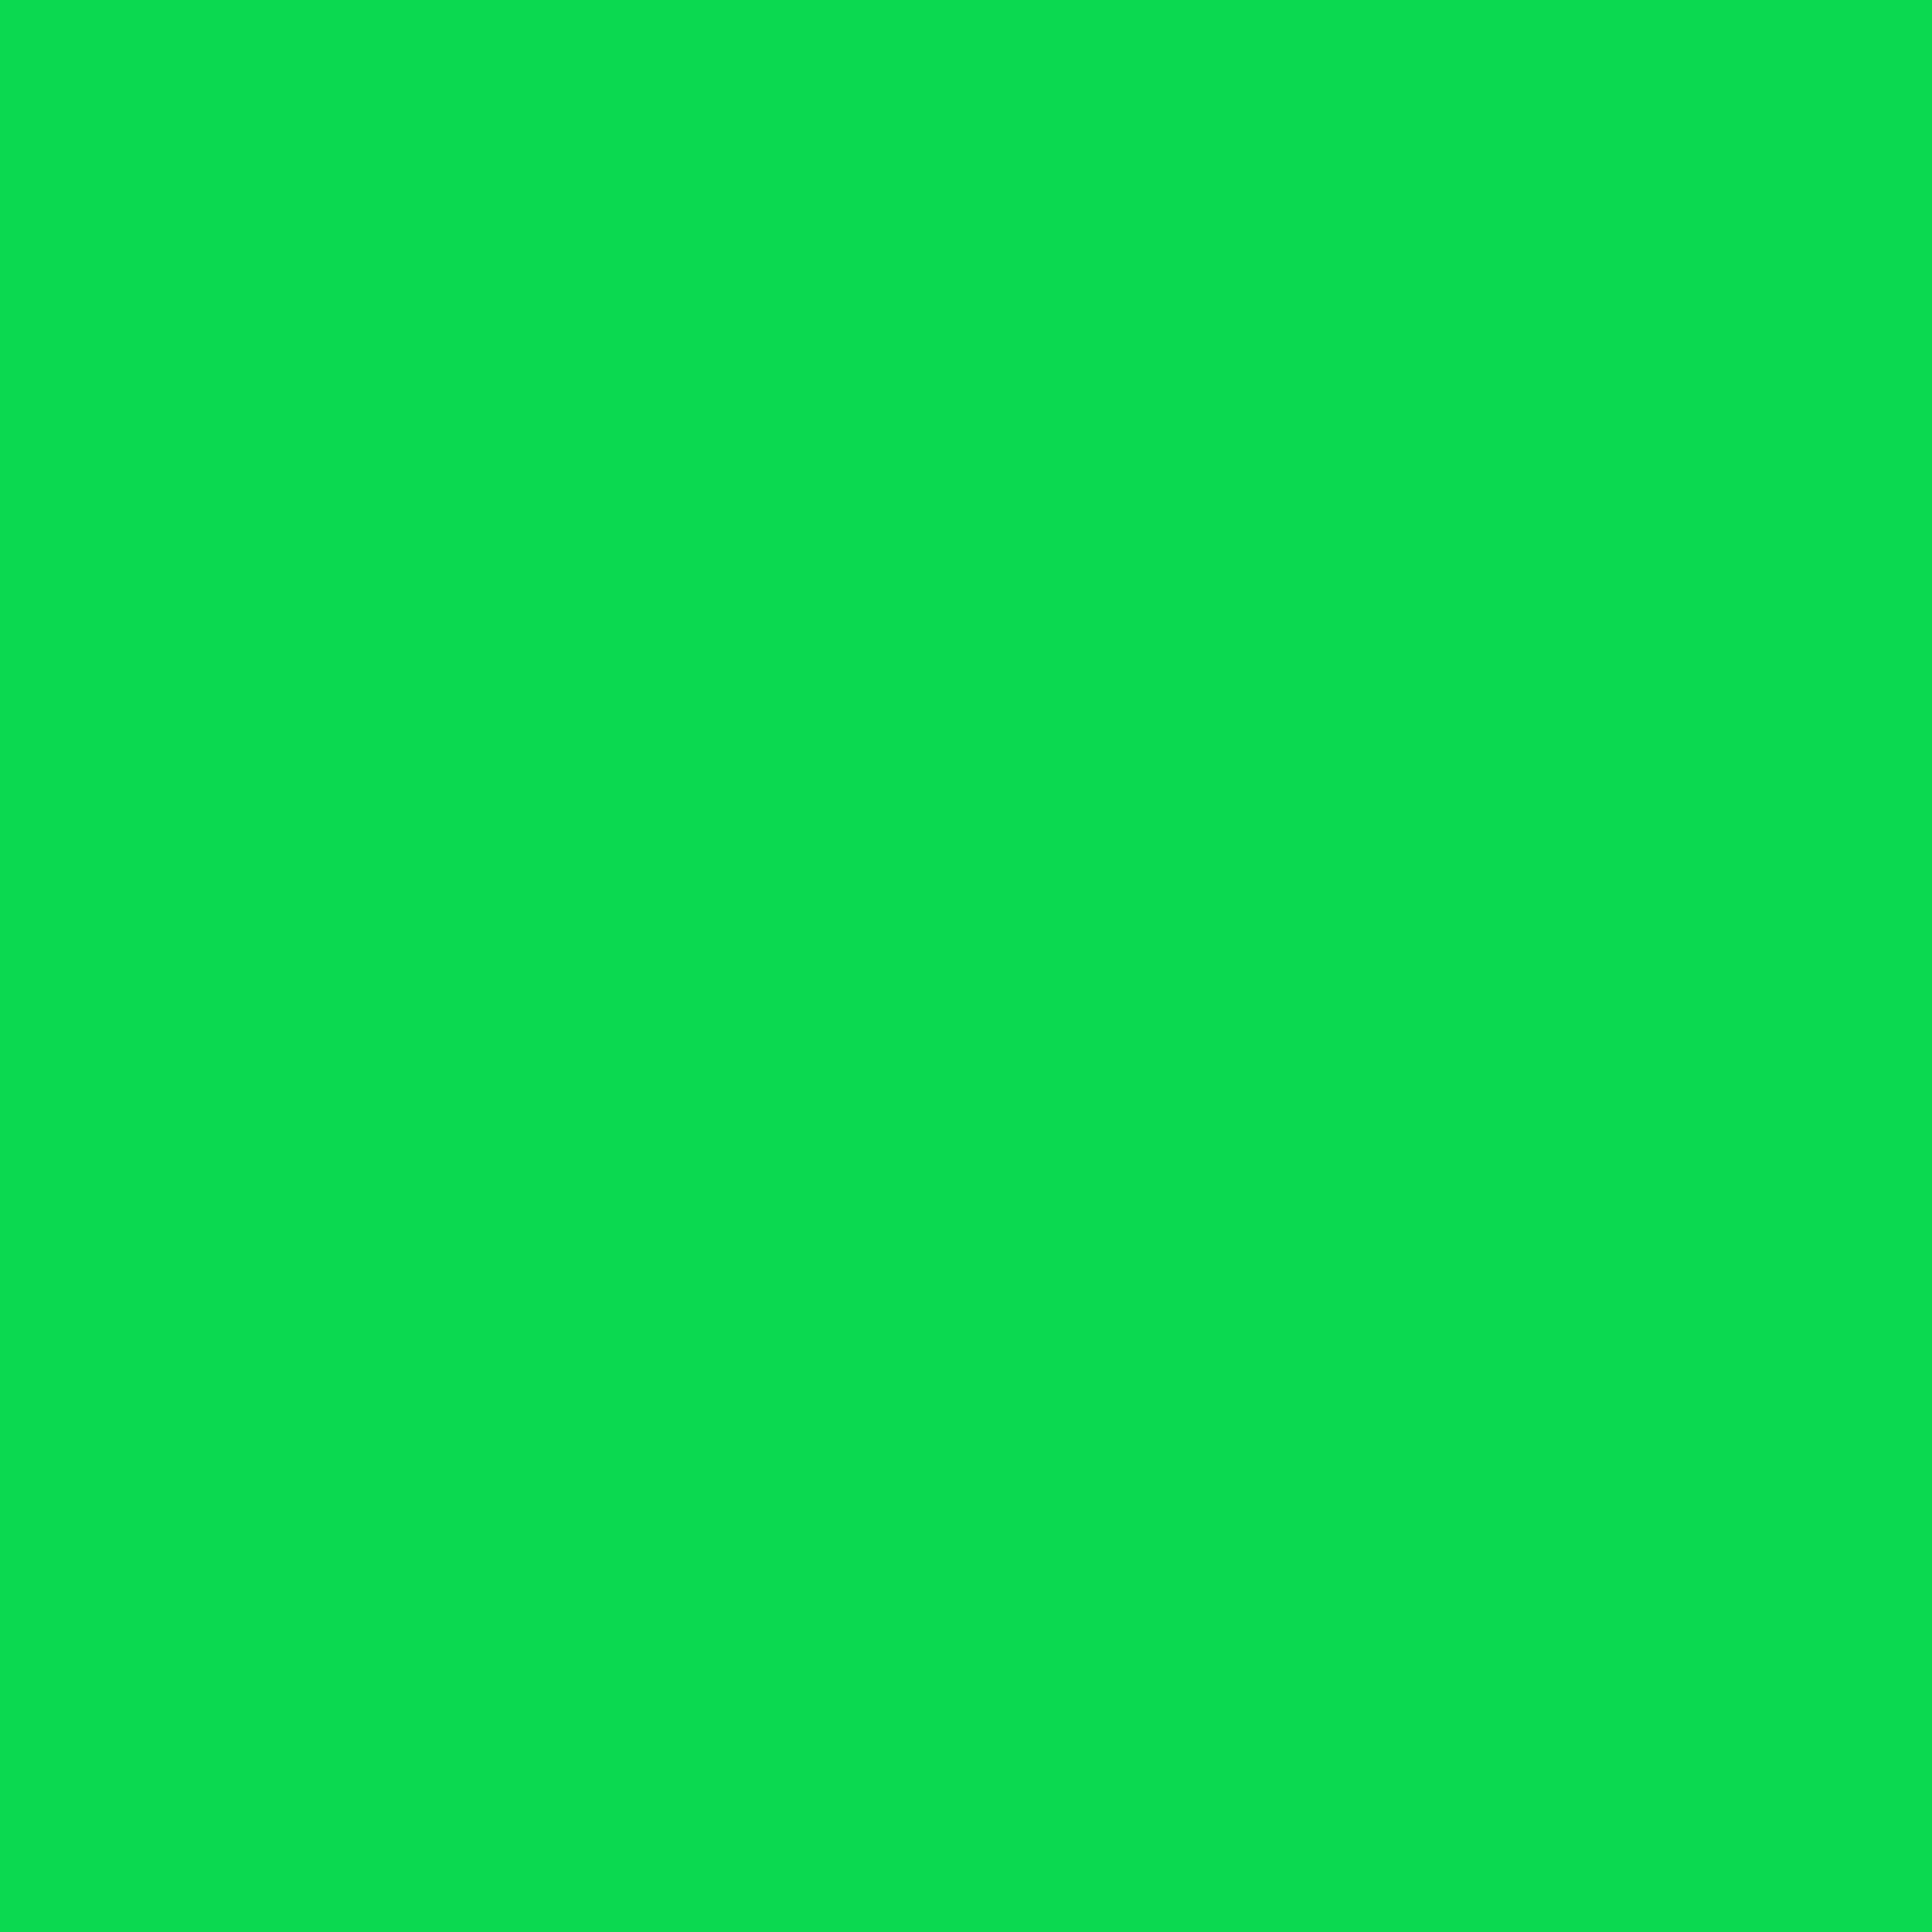 2048x2048 Malachite Solid Color Background